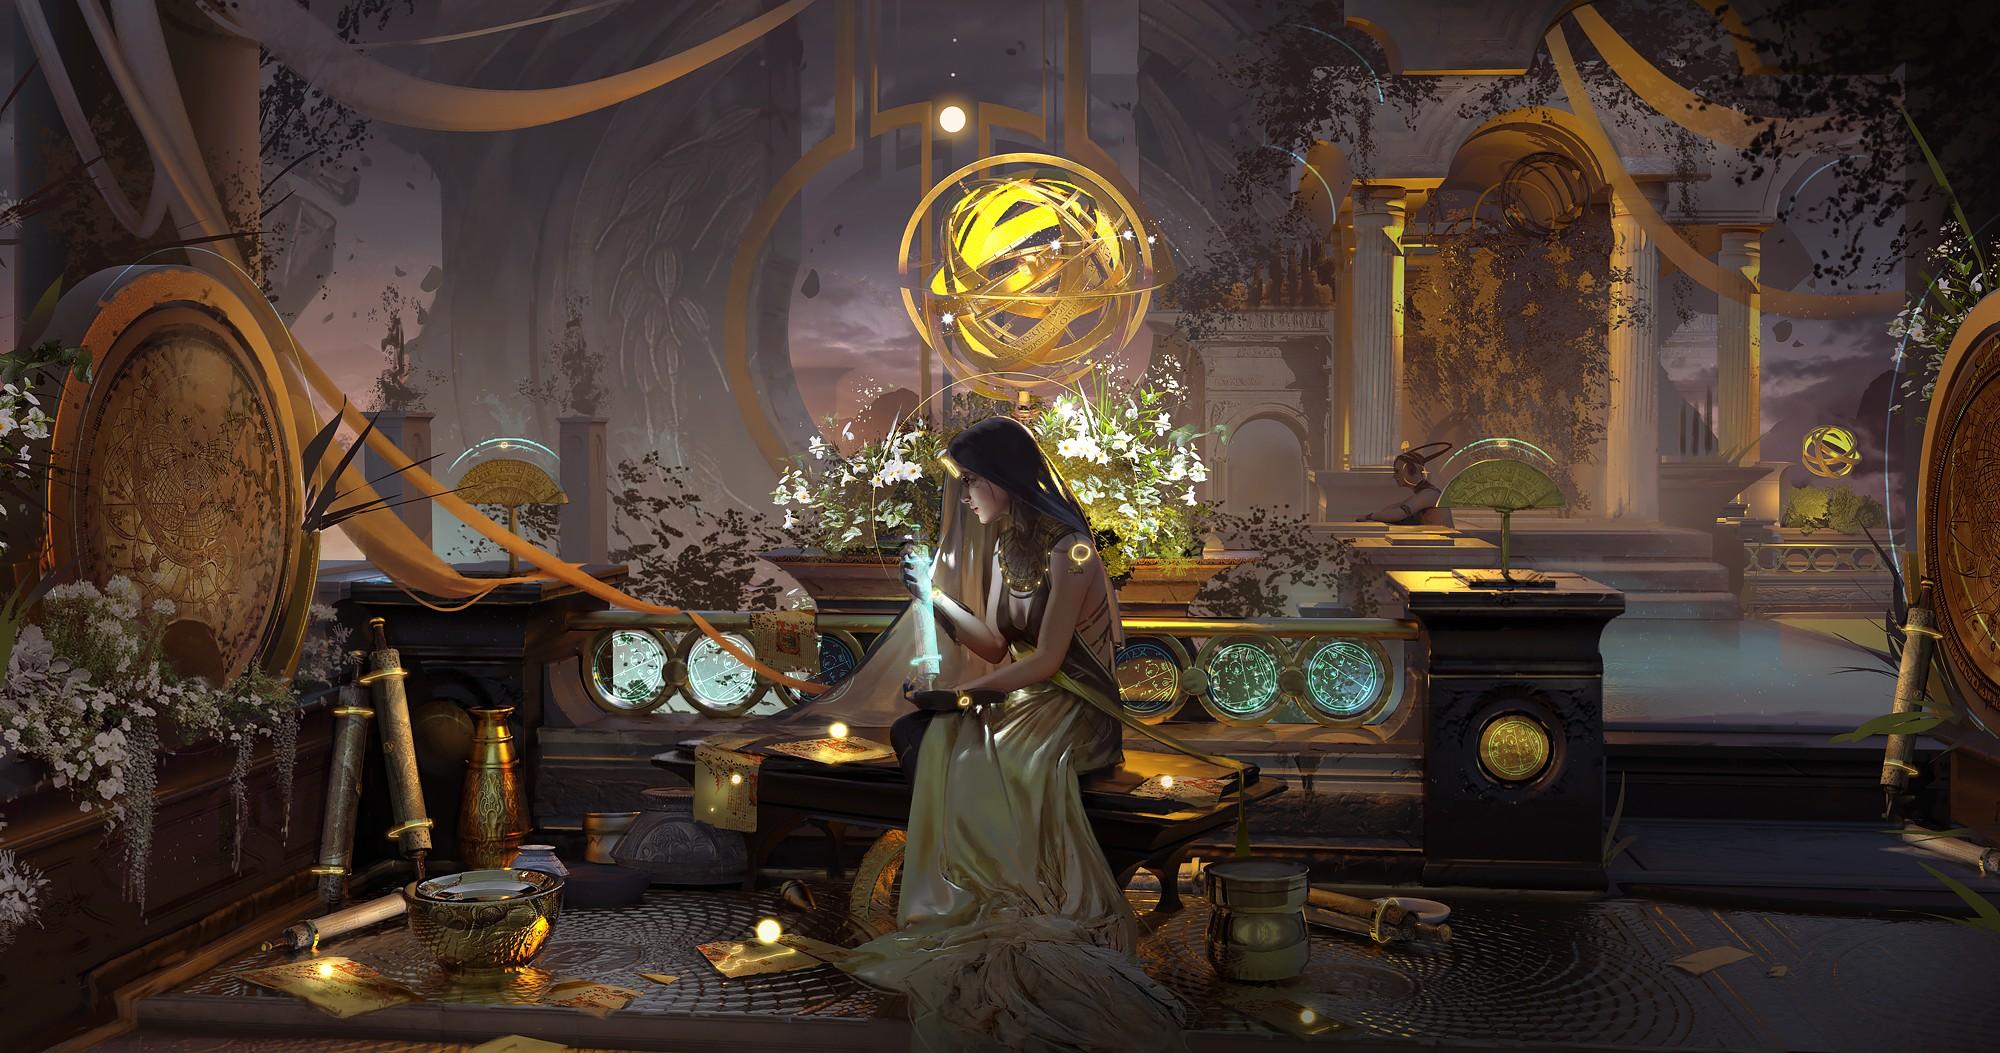 General 2000x1053 Magdalena Radziej digital art fantasy art fantasy girl sitting scrolls indoors sphere gold profile fantasy architecture dress